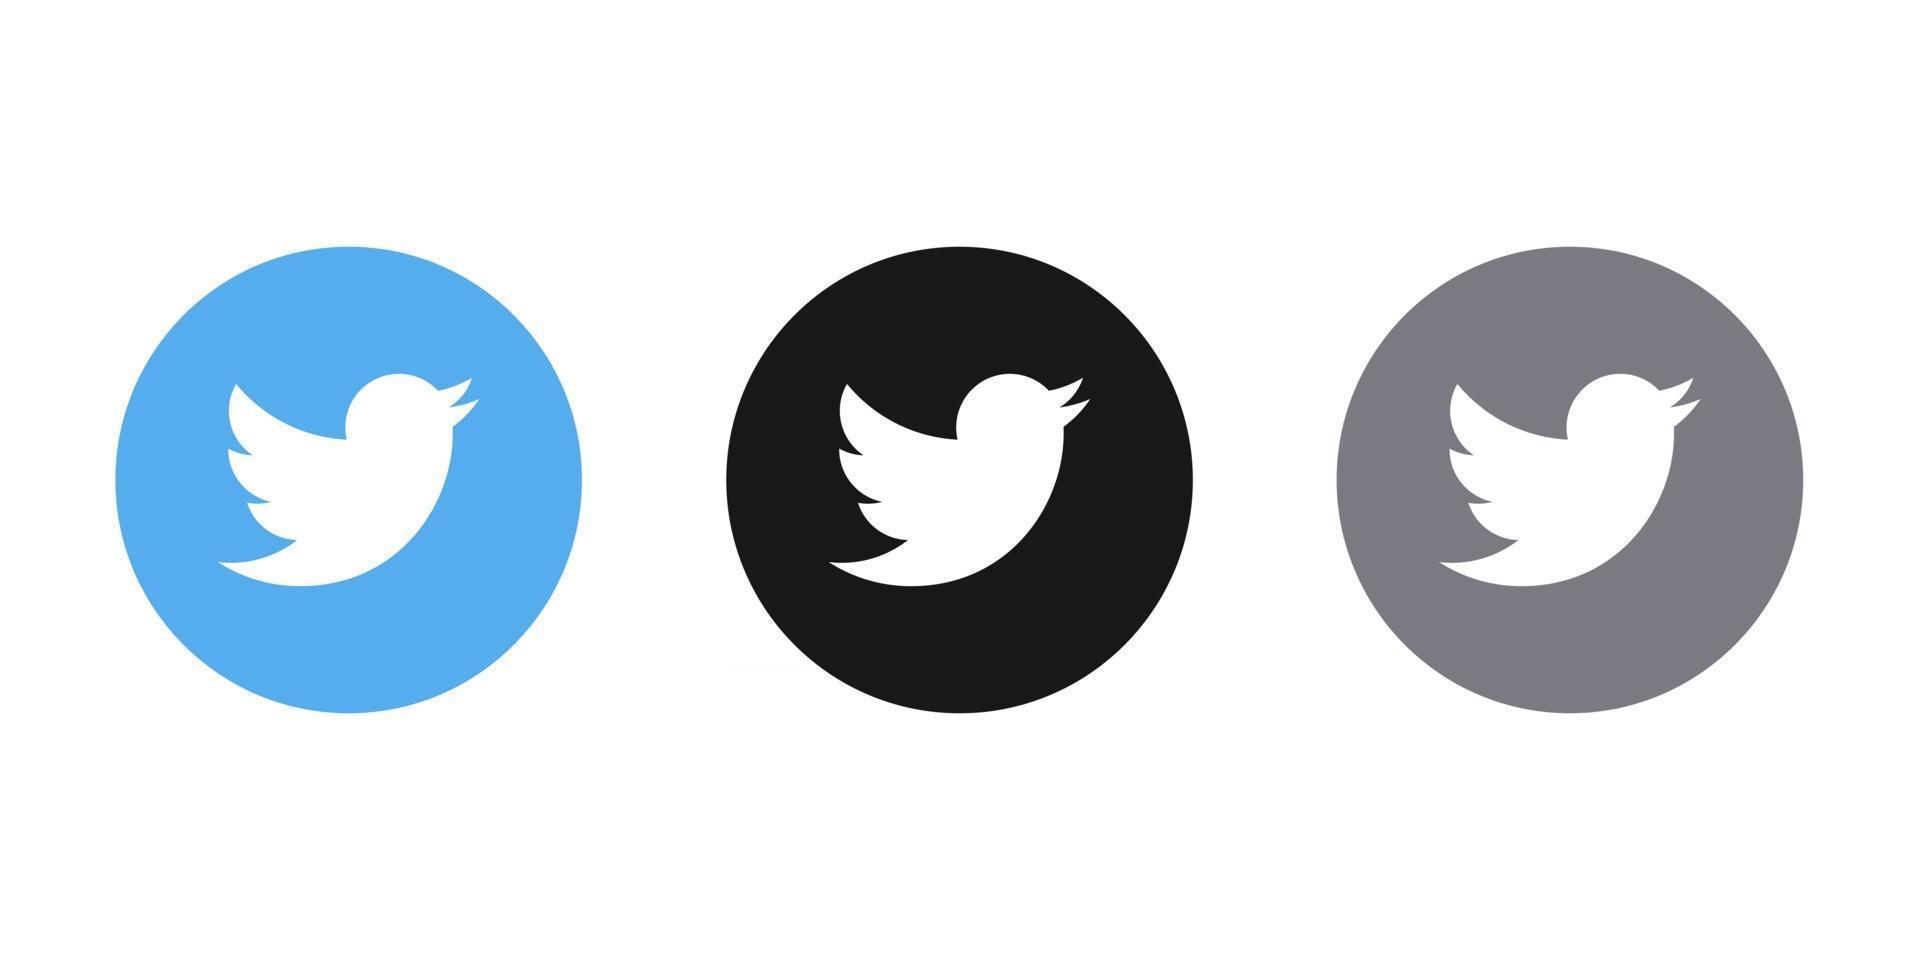 social media icon twitter black grey blue logos bundle vector